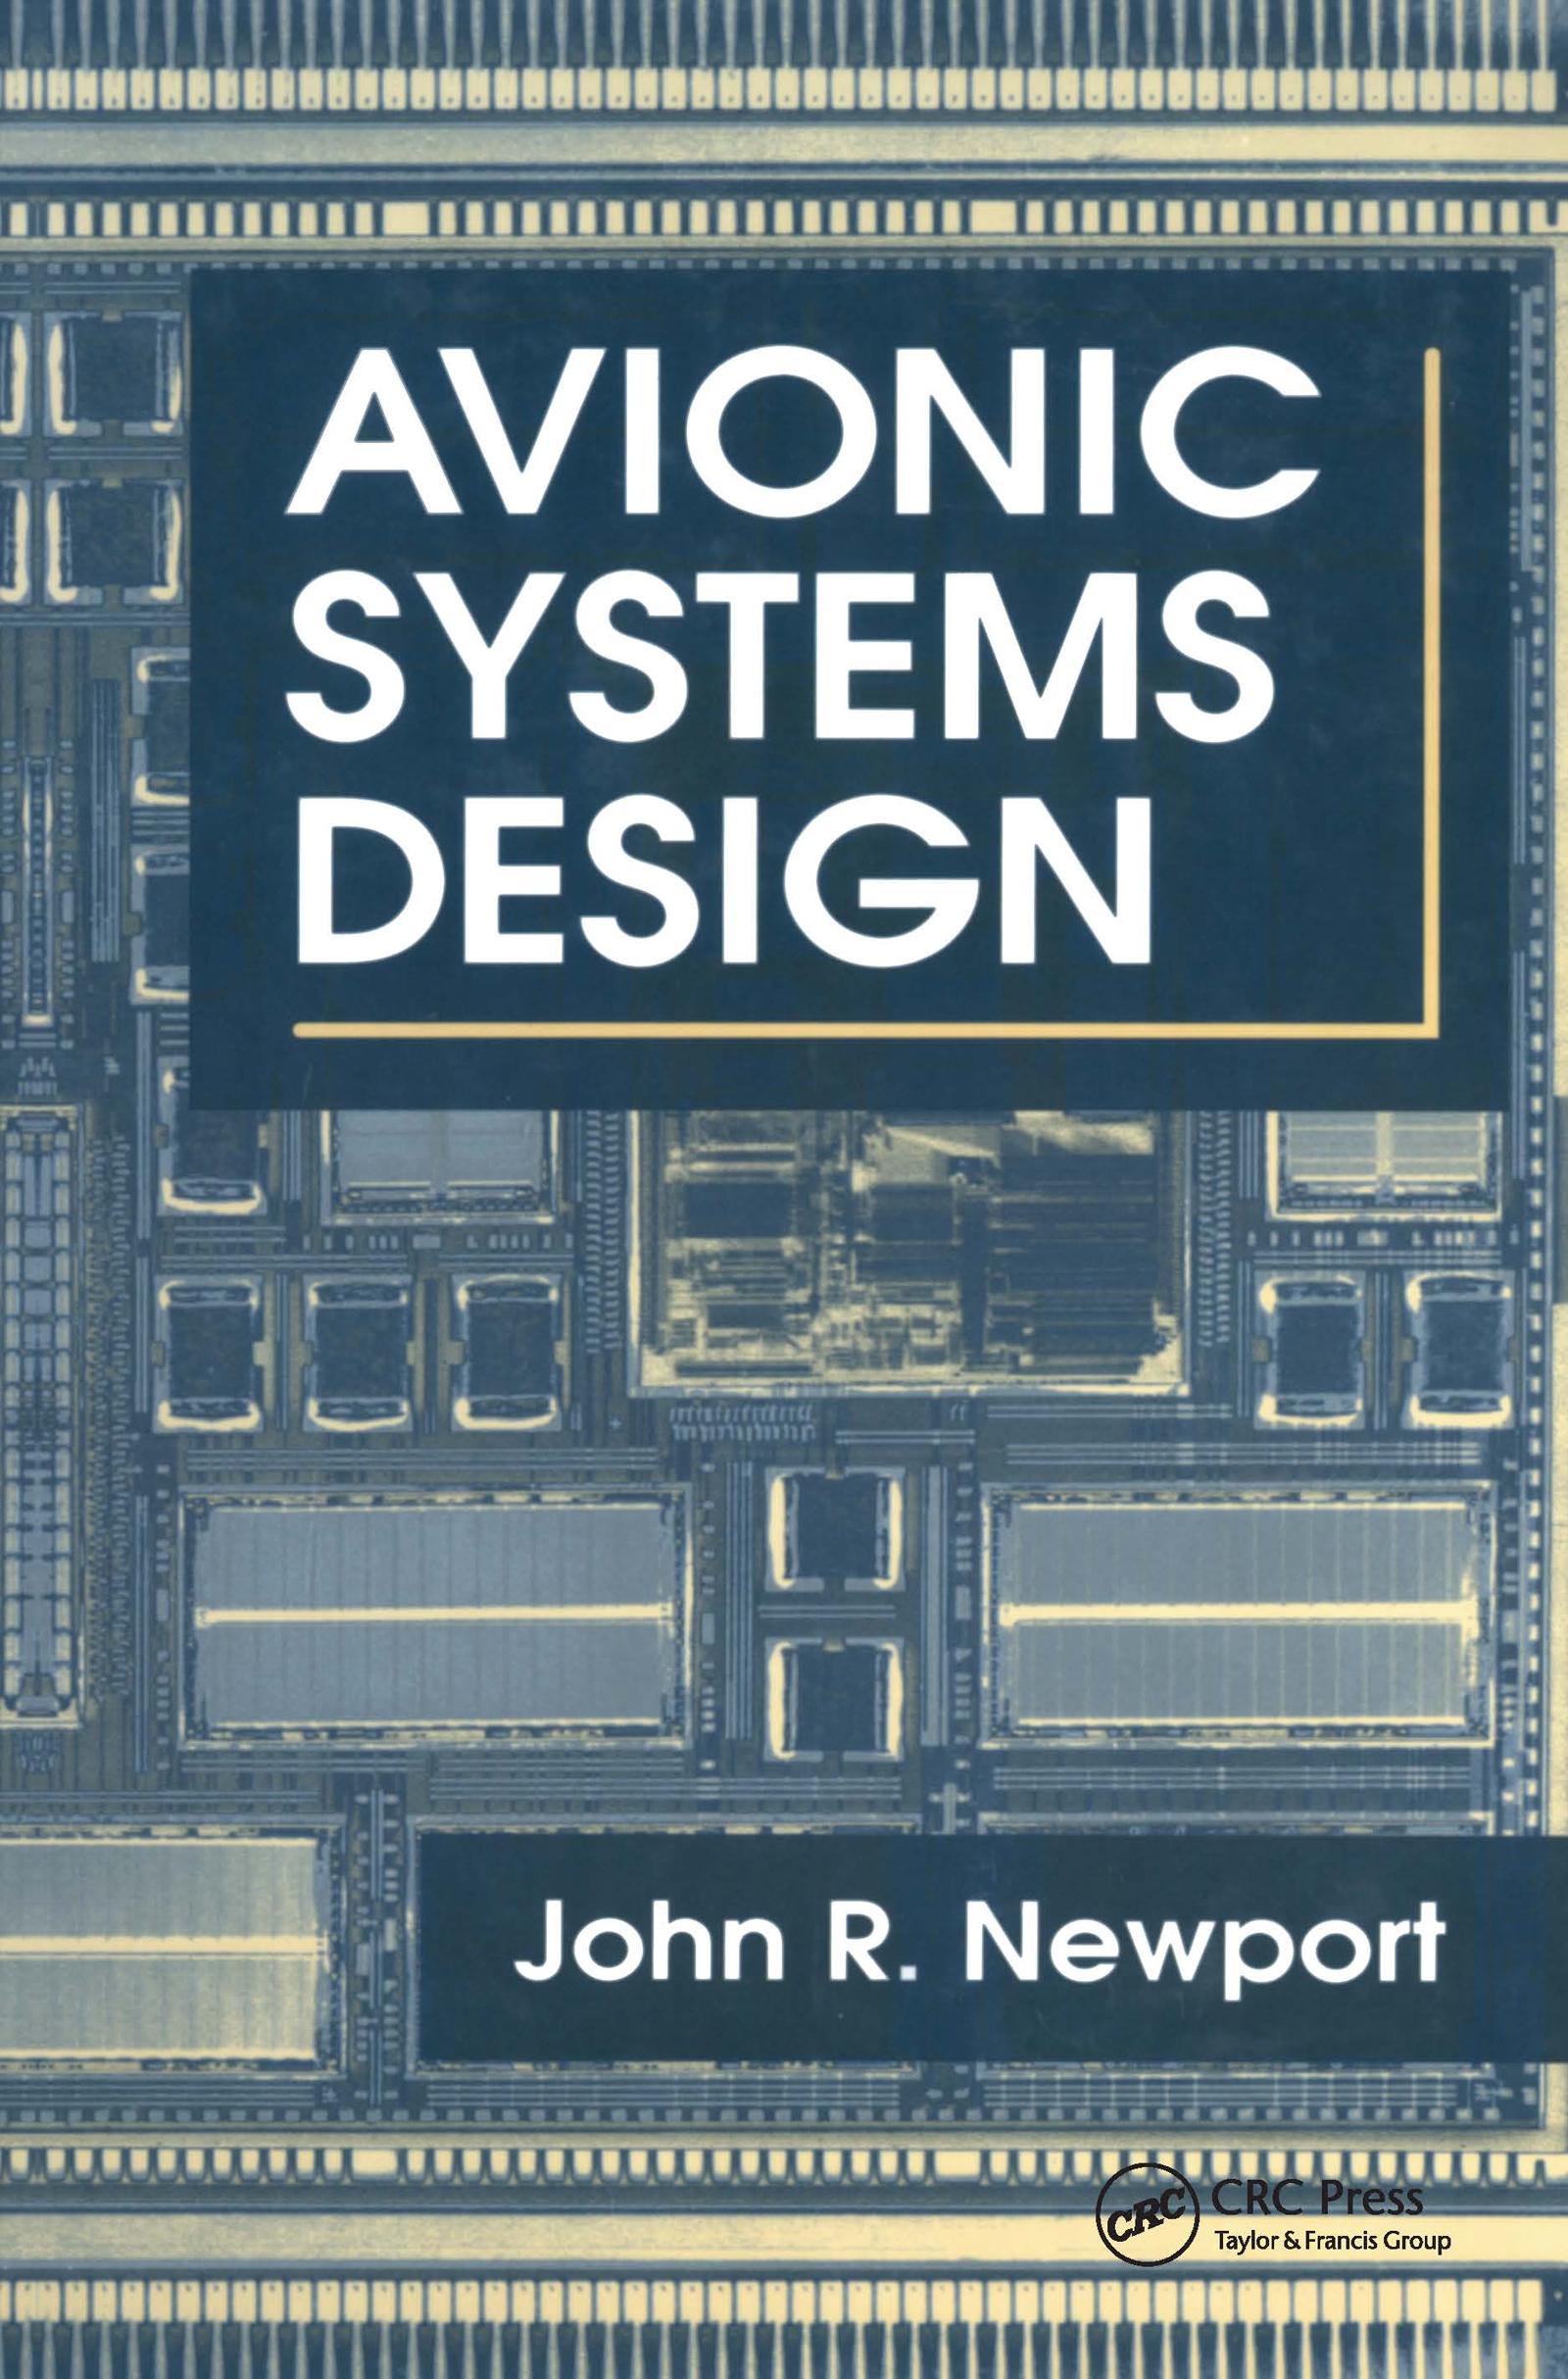 Avionic Systems Design: 1st Edition (Hardback) book cover